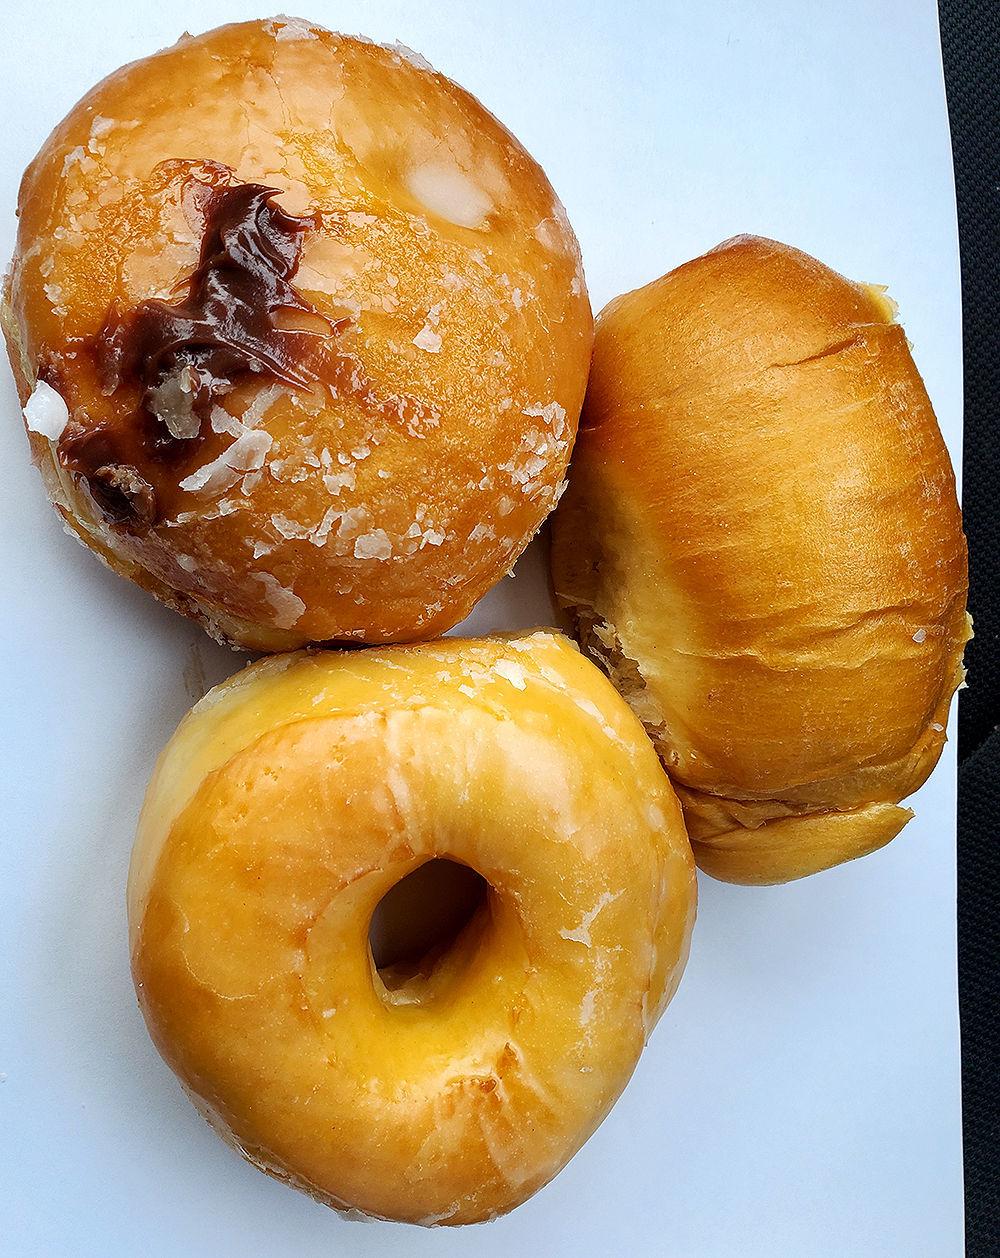 20200322-news-donut_shop.jpg